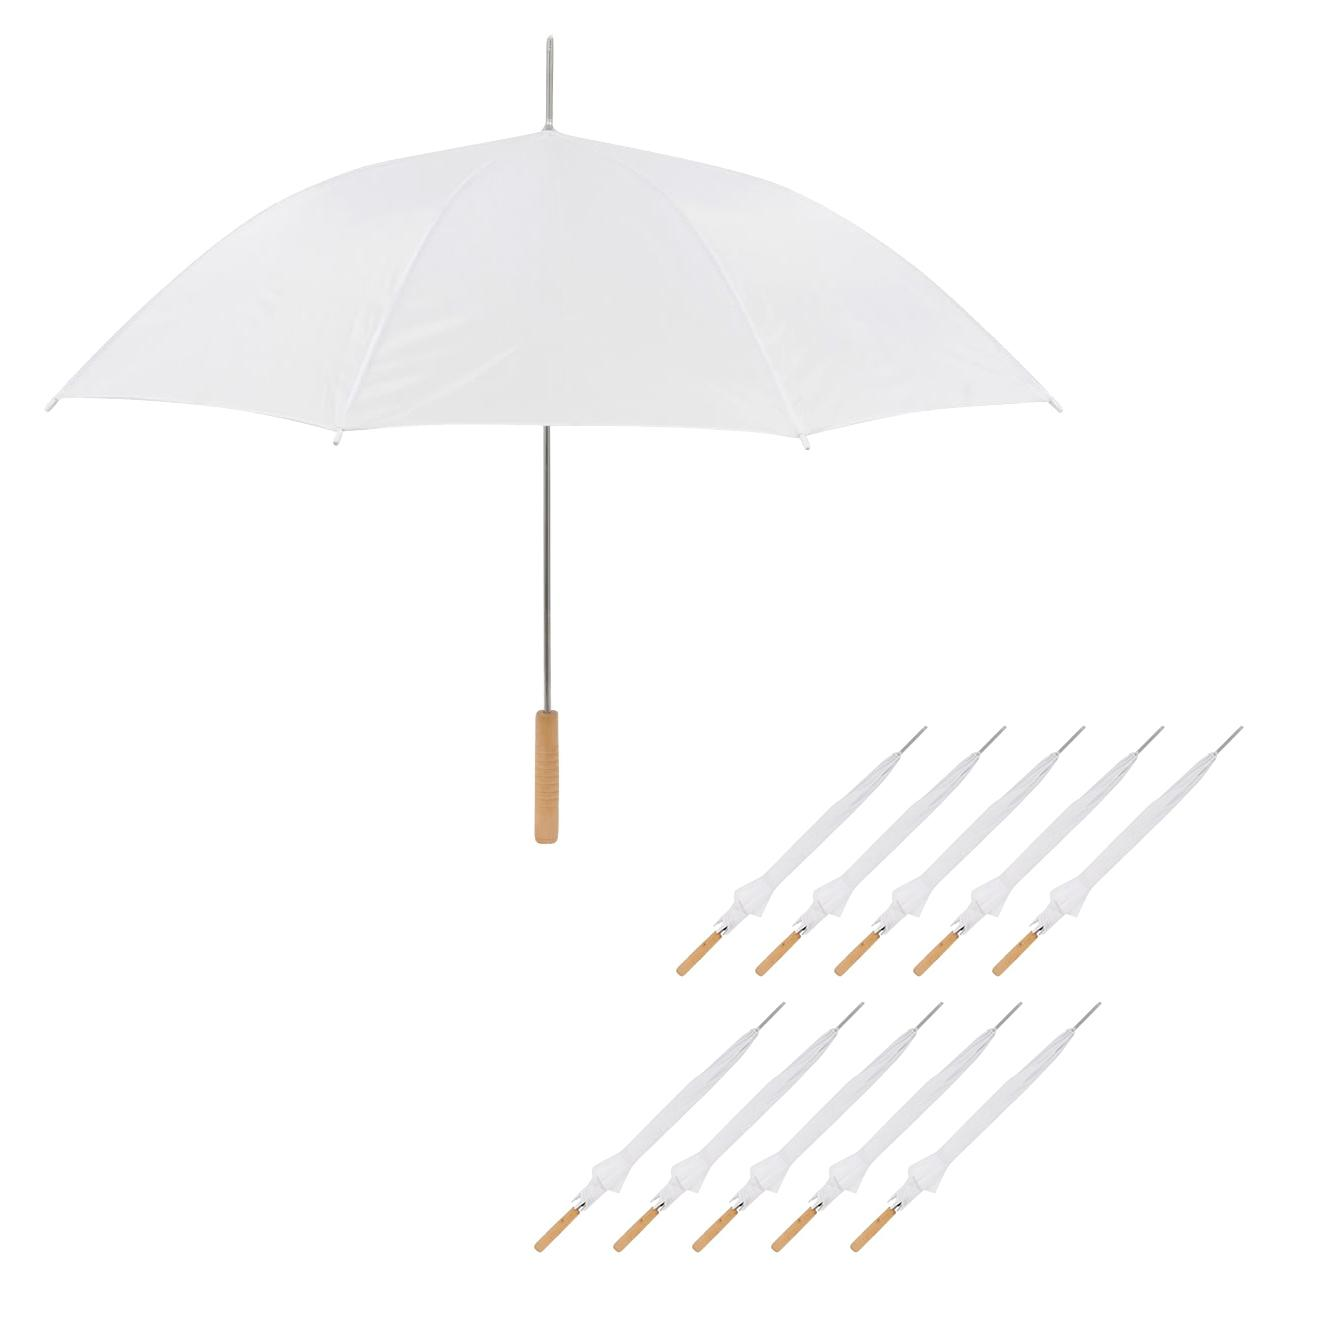 Amazon.com: Anderson Umbrella UM-35-WHITE-10 Wedding